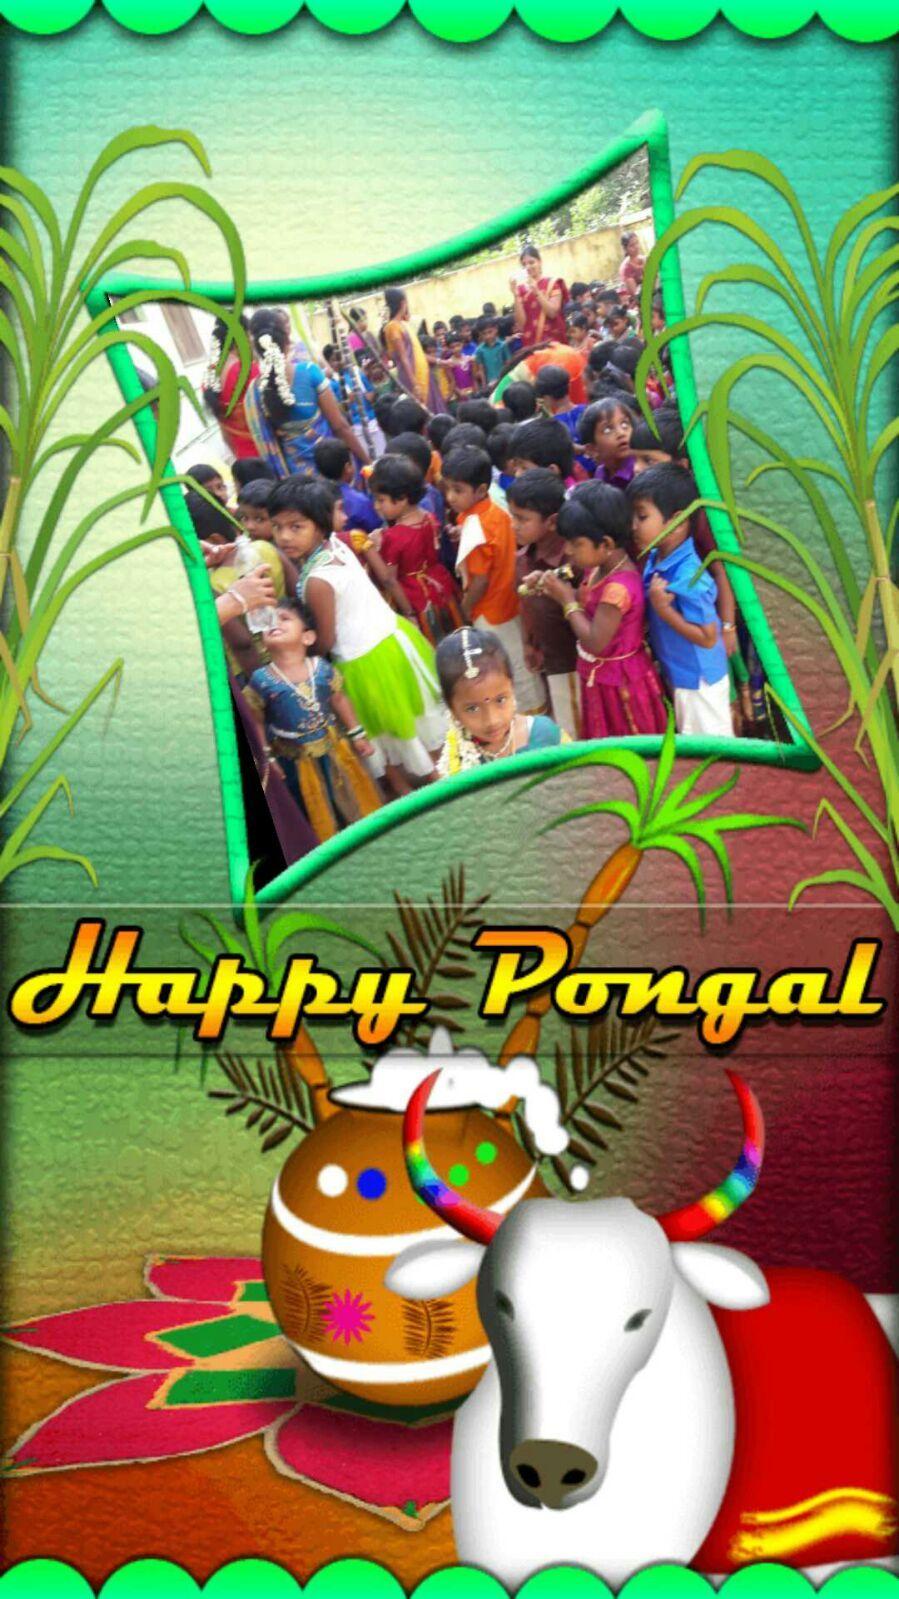 Pongal celebration in Newtunkids Mannargudi   Newtunkids